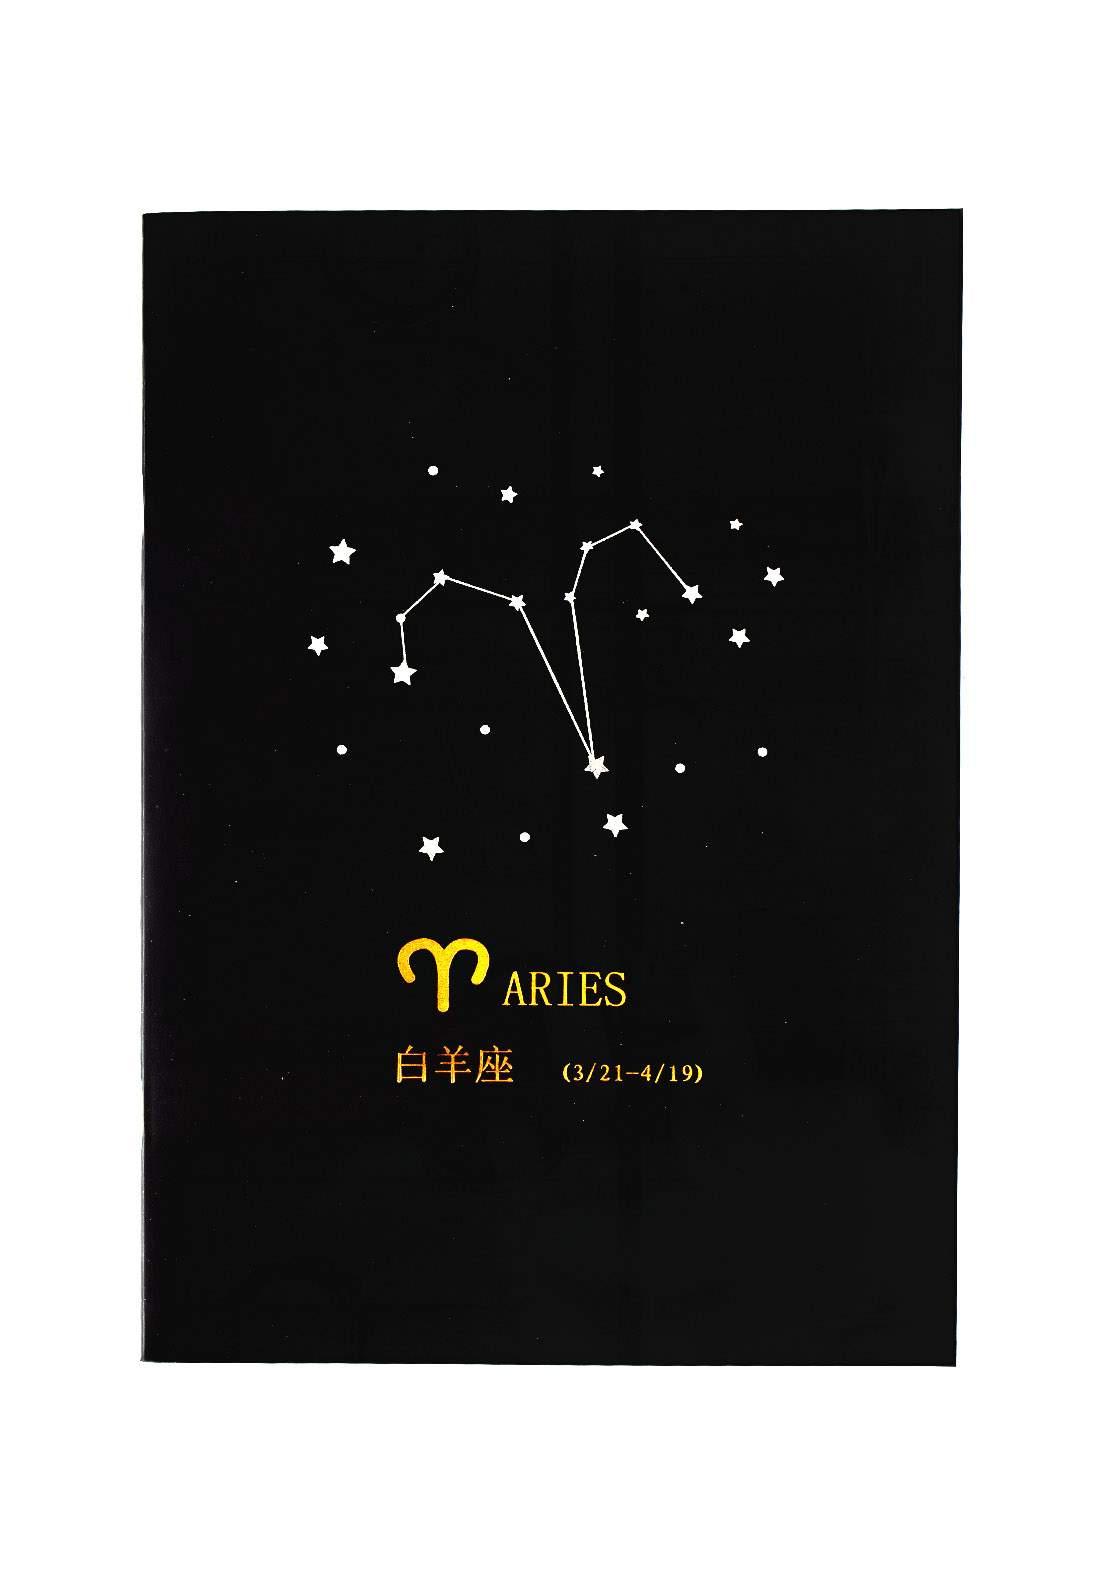 Big Black Drawing Book 24 Sheets-Aries دفتر رسم اسود كبير بطبعة برج الحمل